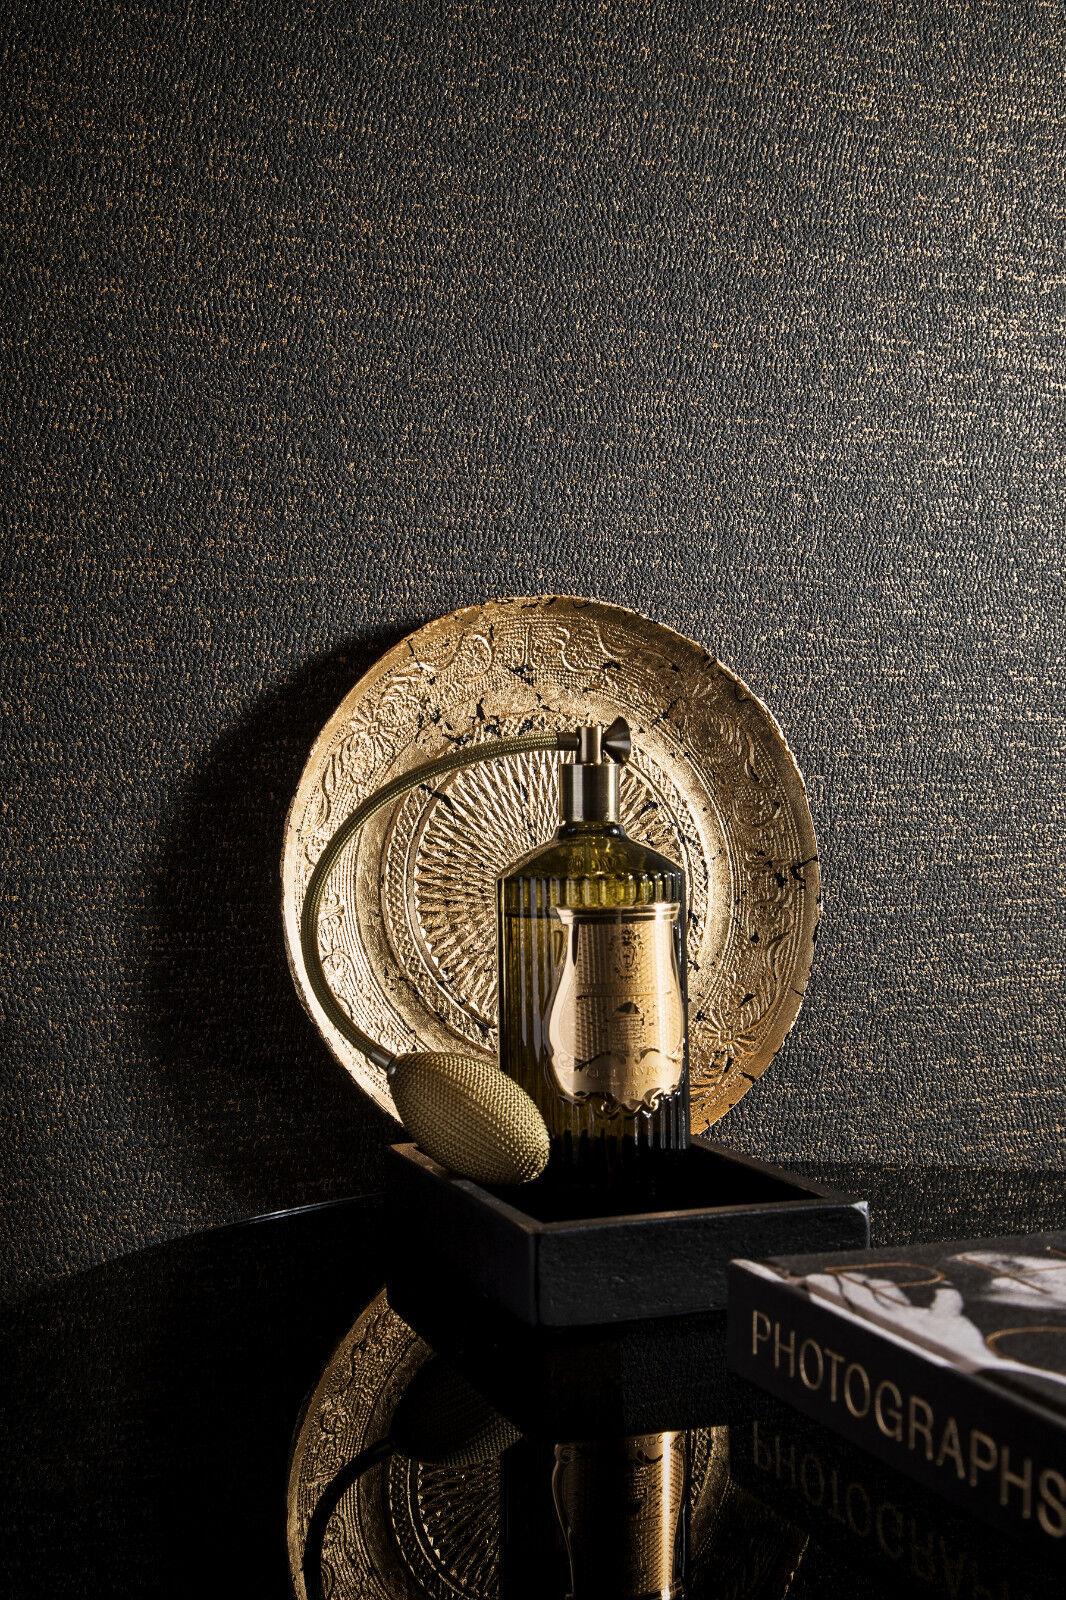 vlies tapete uni struktur dunkel braun schwarz gold loft ebay. Black Bedroom Furniture Sets. Home Design Ideas